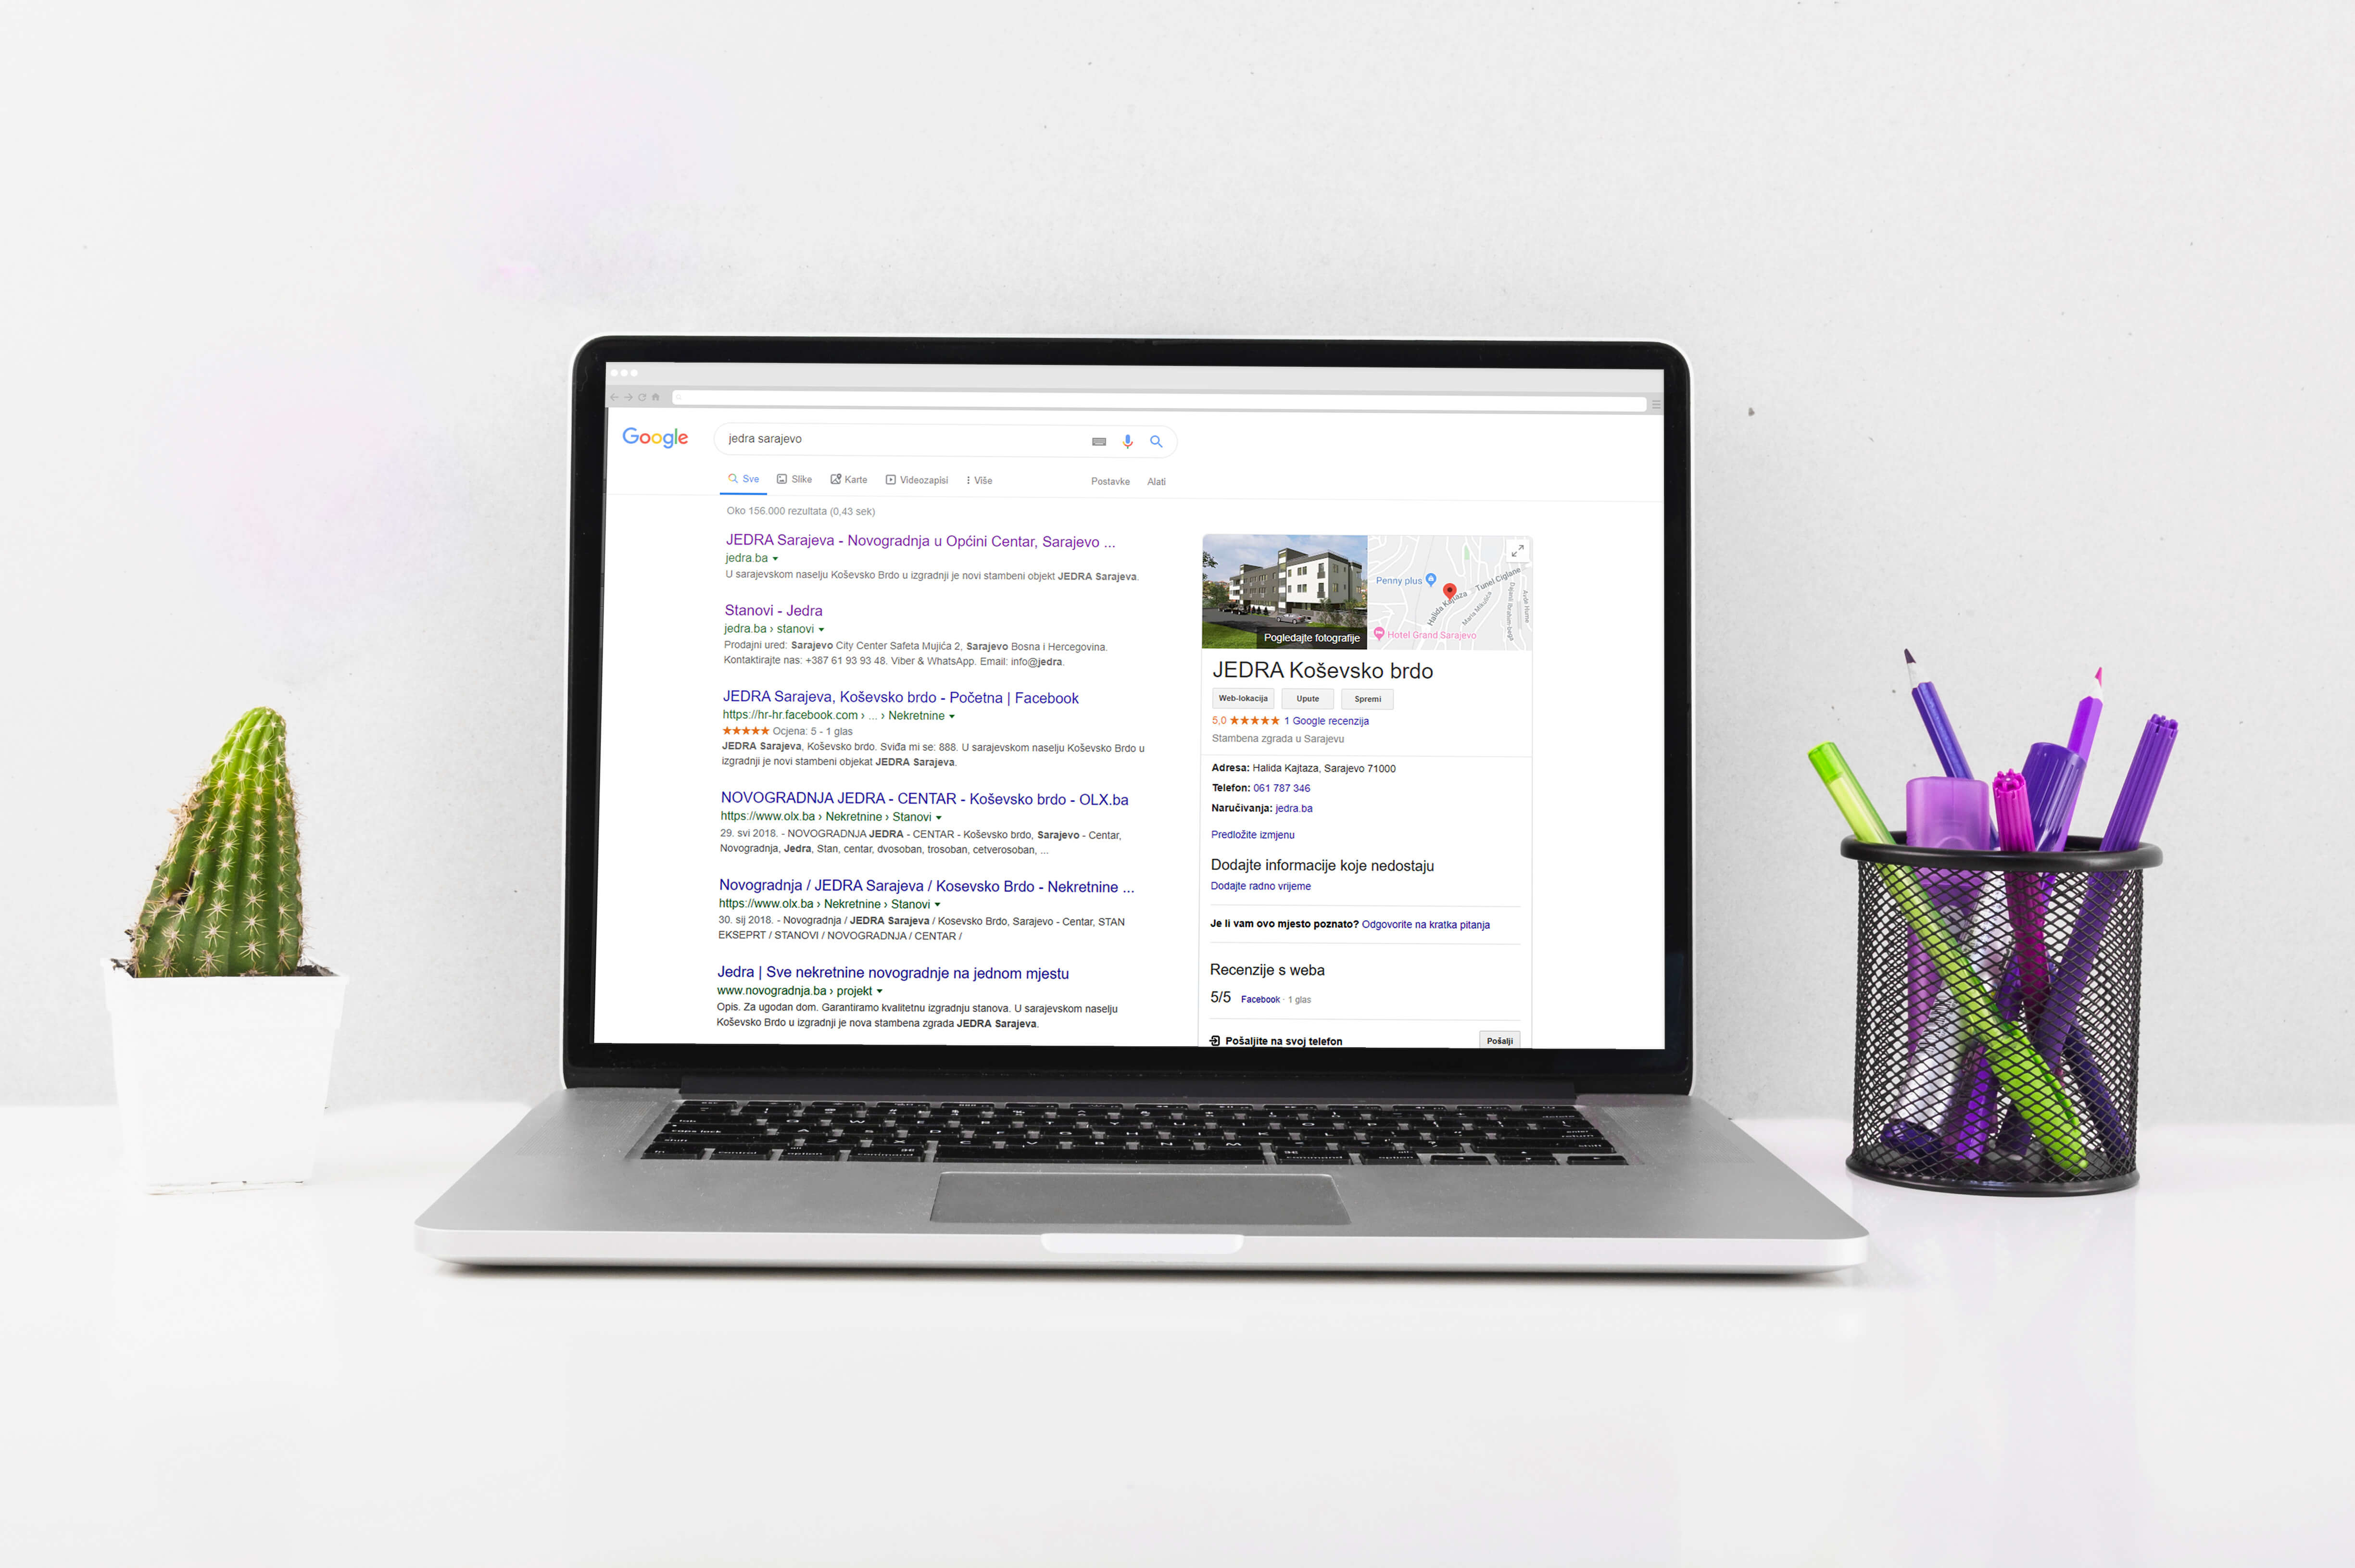 Project Jedra, Google Advertising